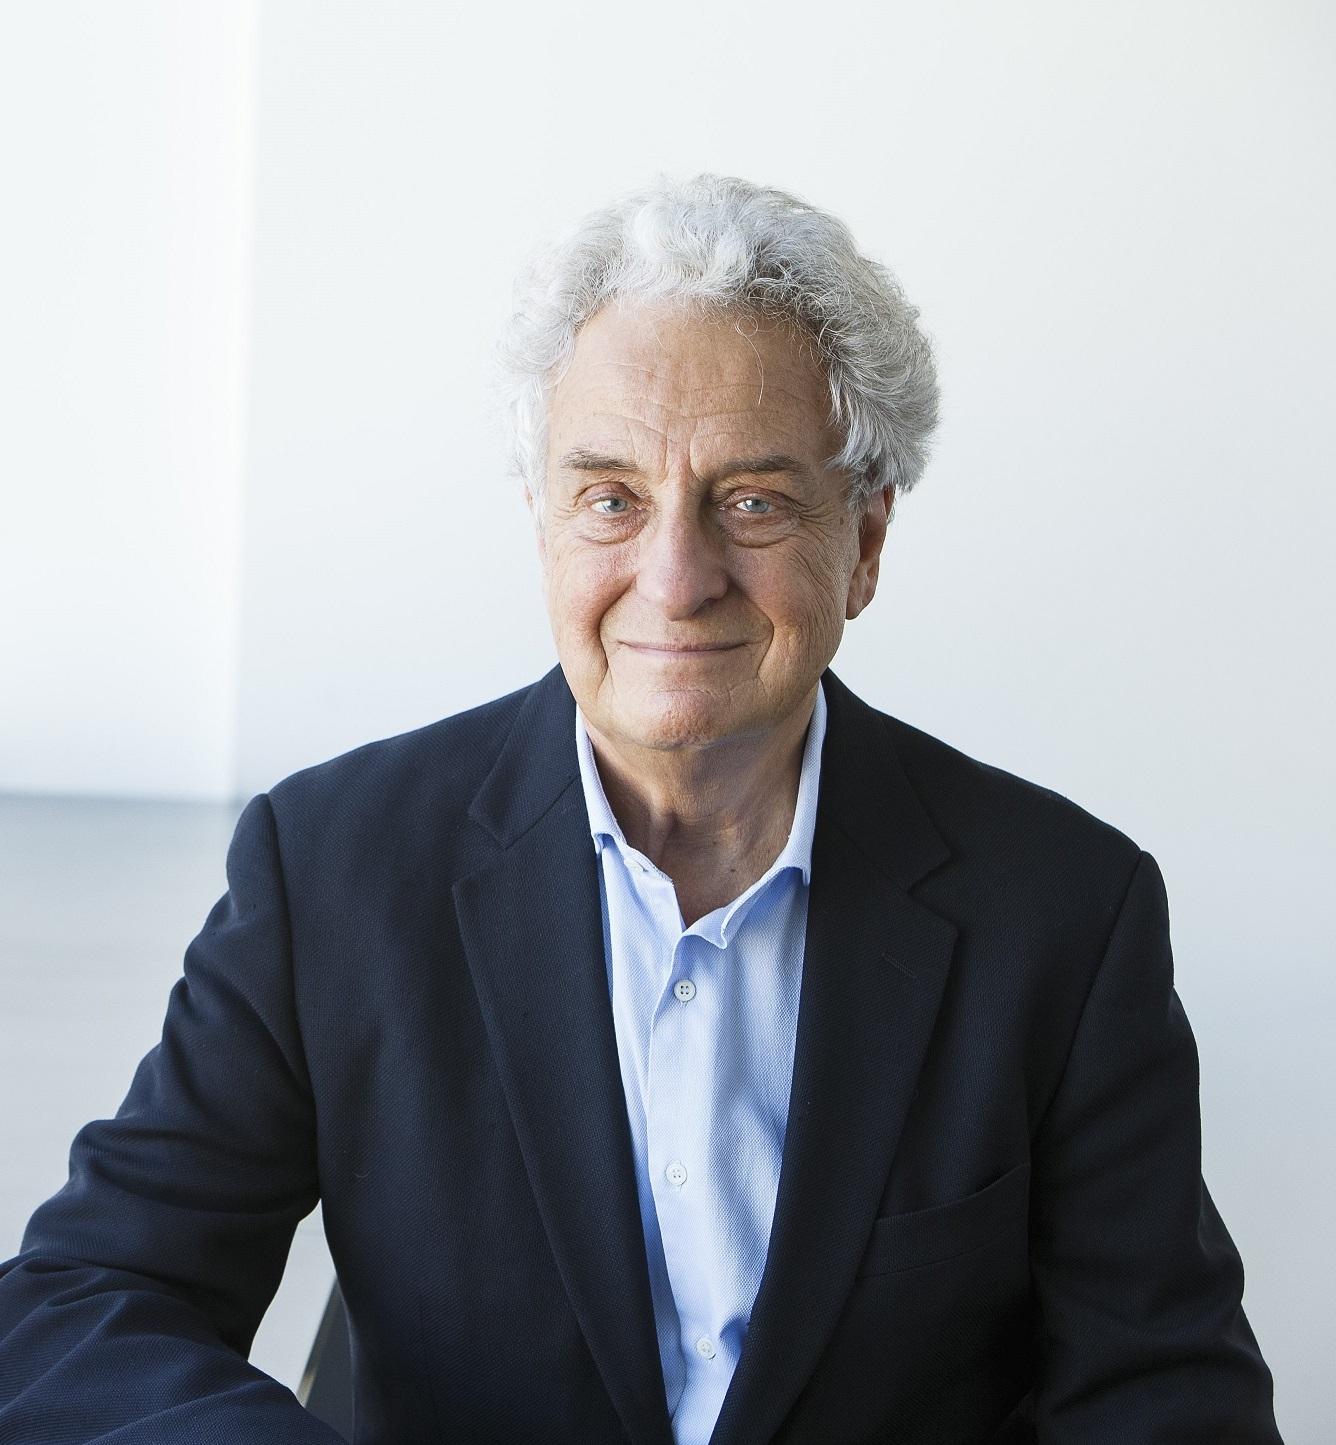 Scientia Professor John Reginald Piggott